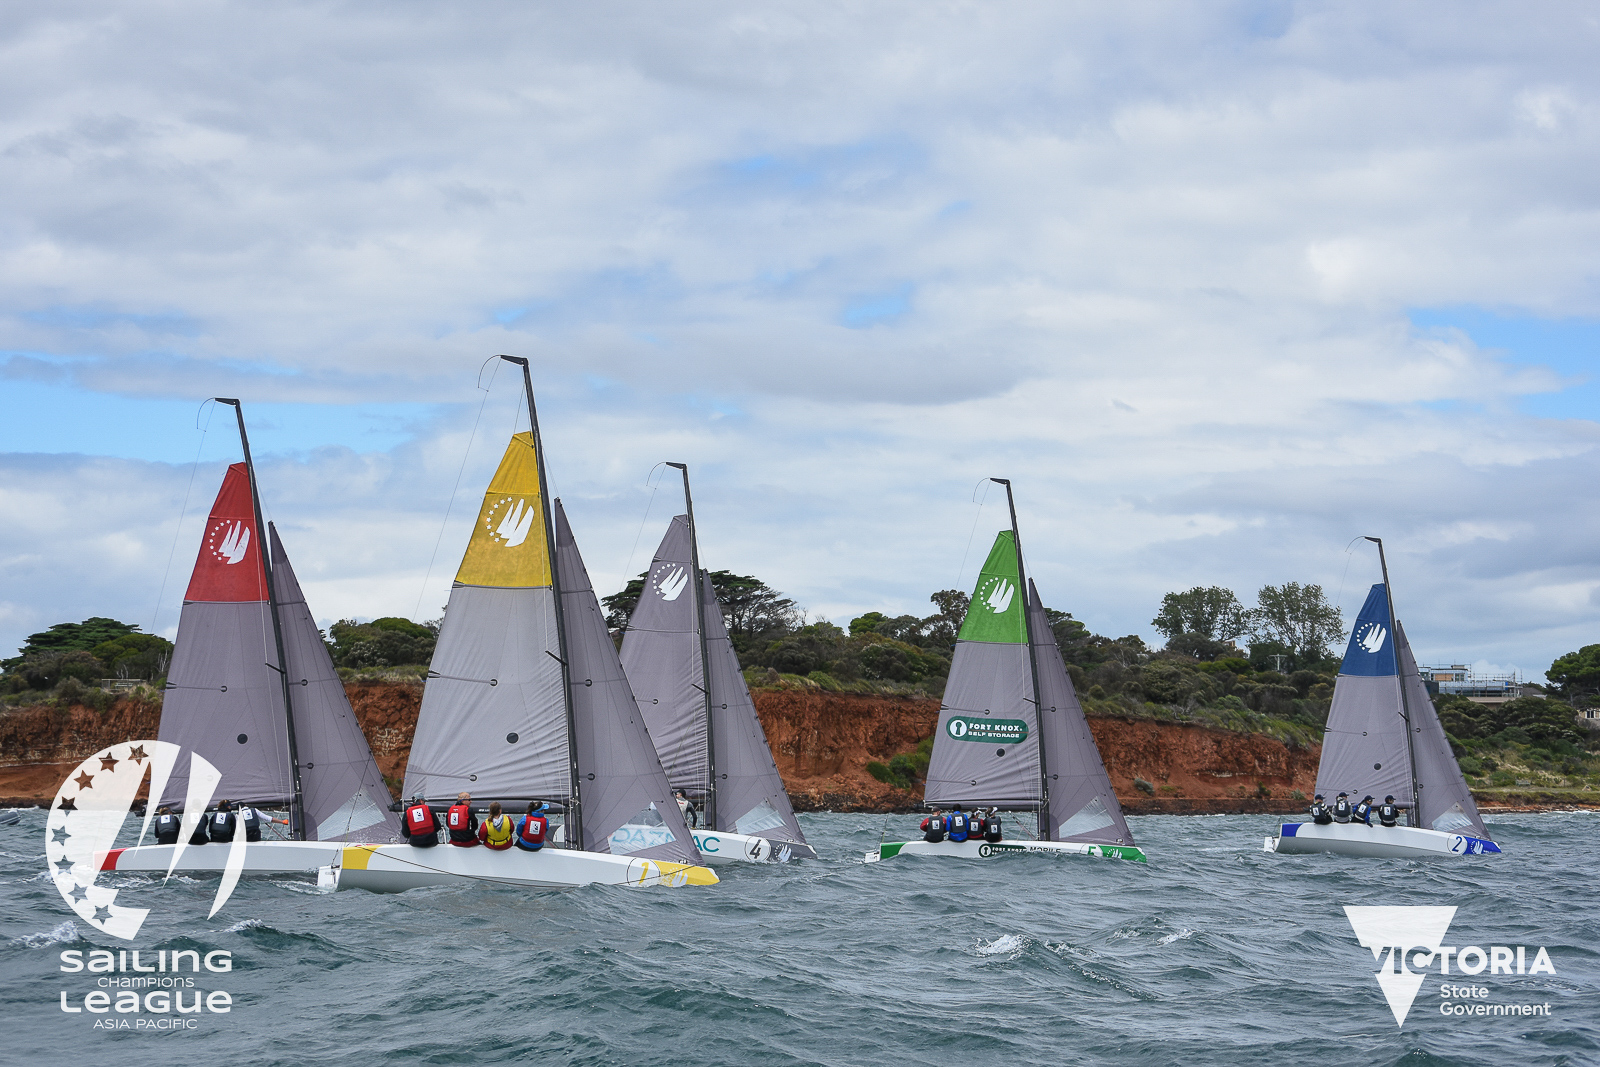 Tassie team wins Sailing Champions League - Asia Pacific opener